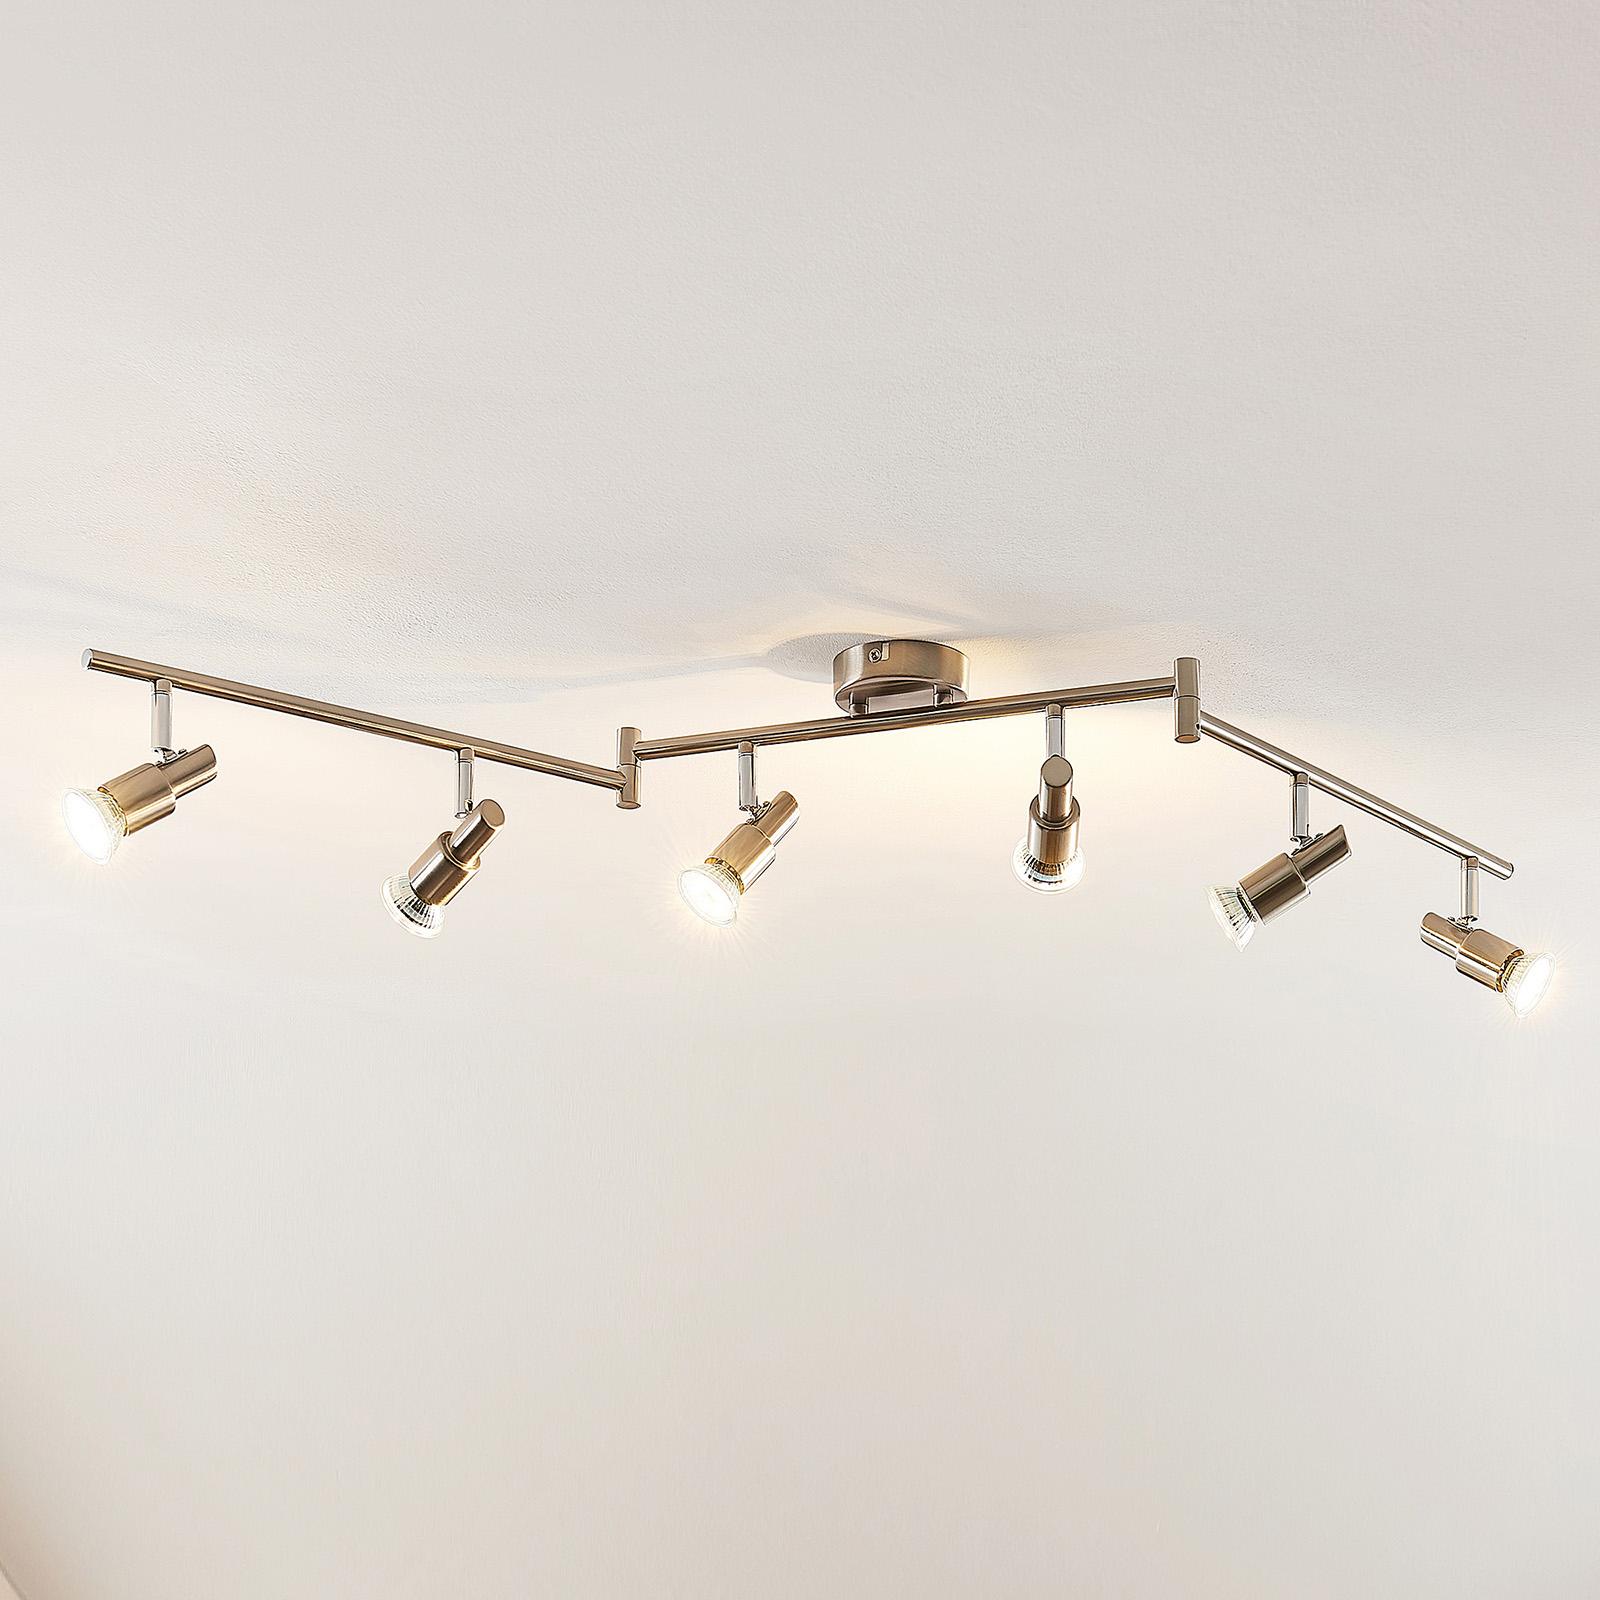 ELC Farida plafonnier LED nickel, 6 lampes